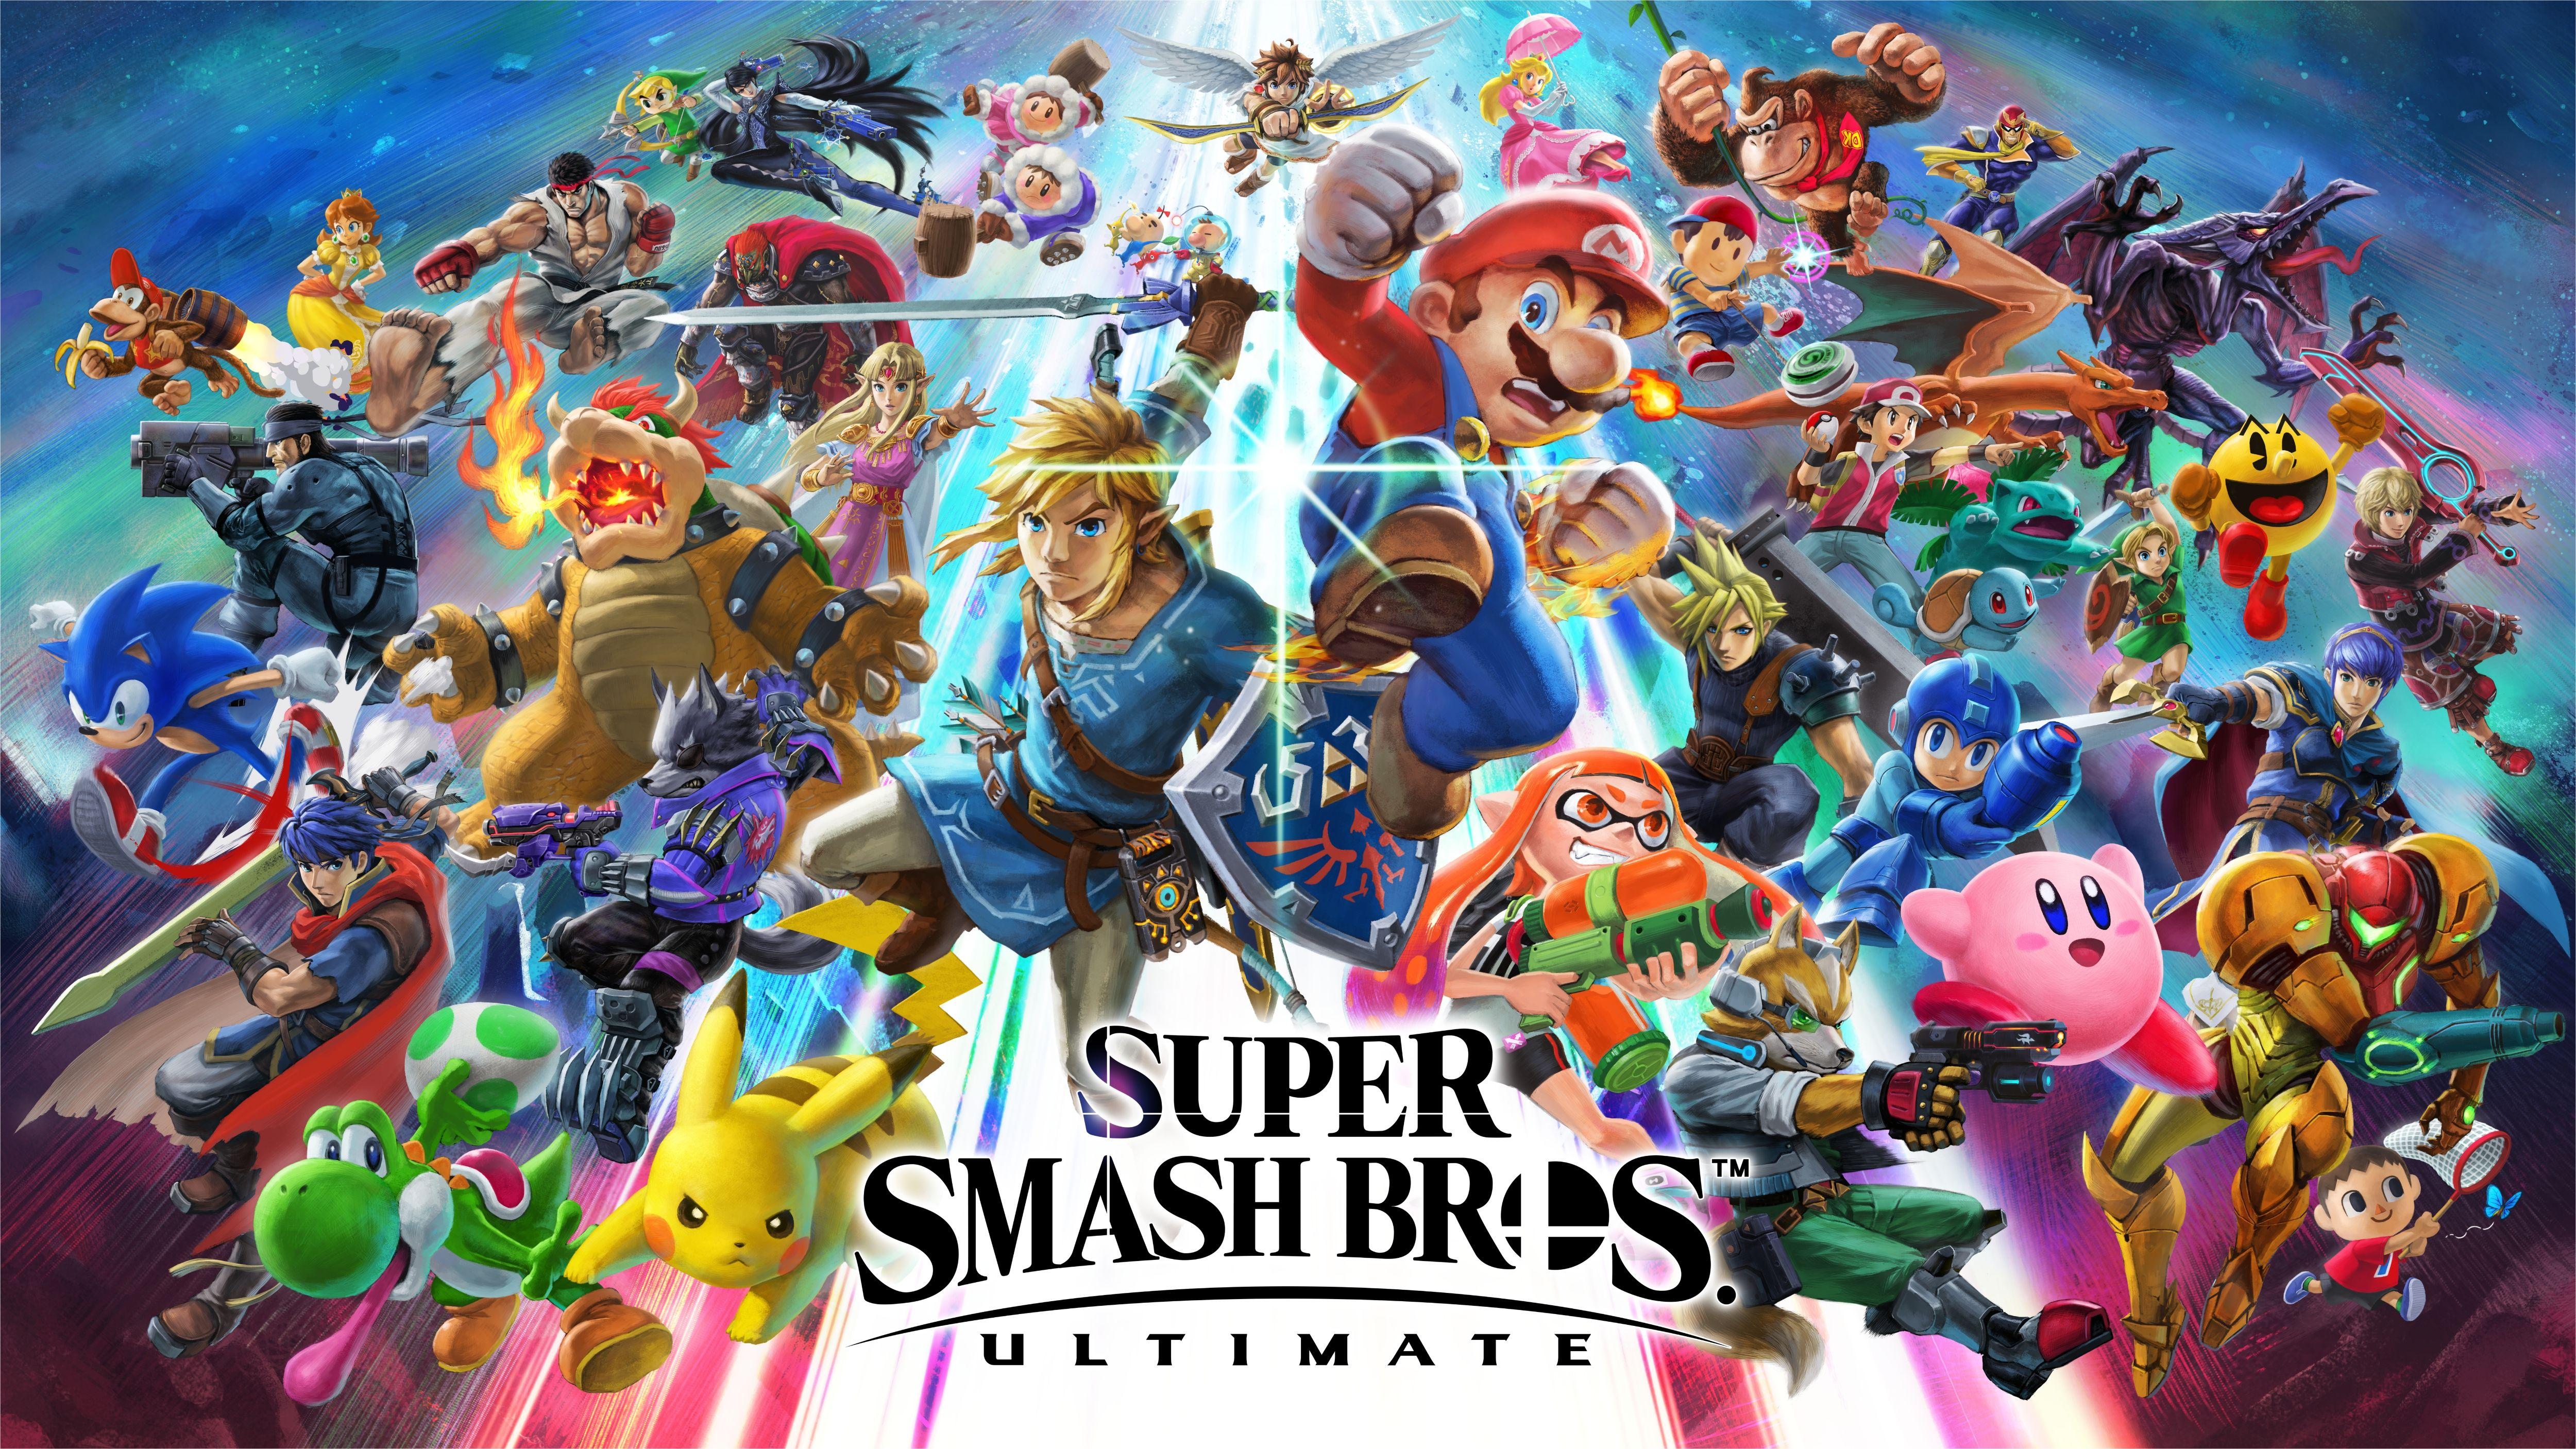 High Resolution Smash Bros Ultimate Artwork Super Smash Bros Super Smash Brothers Smash Brothers